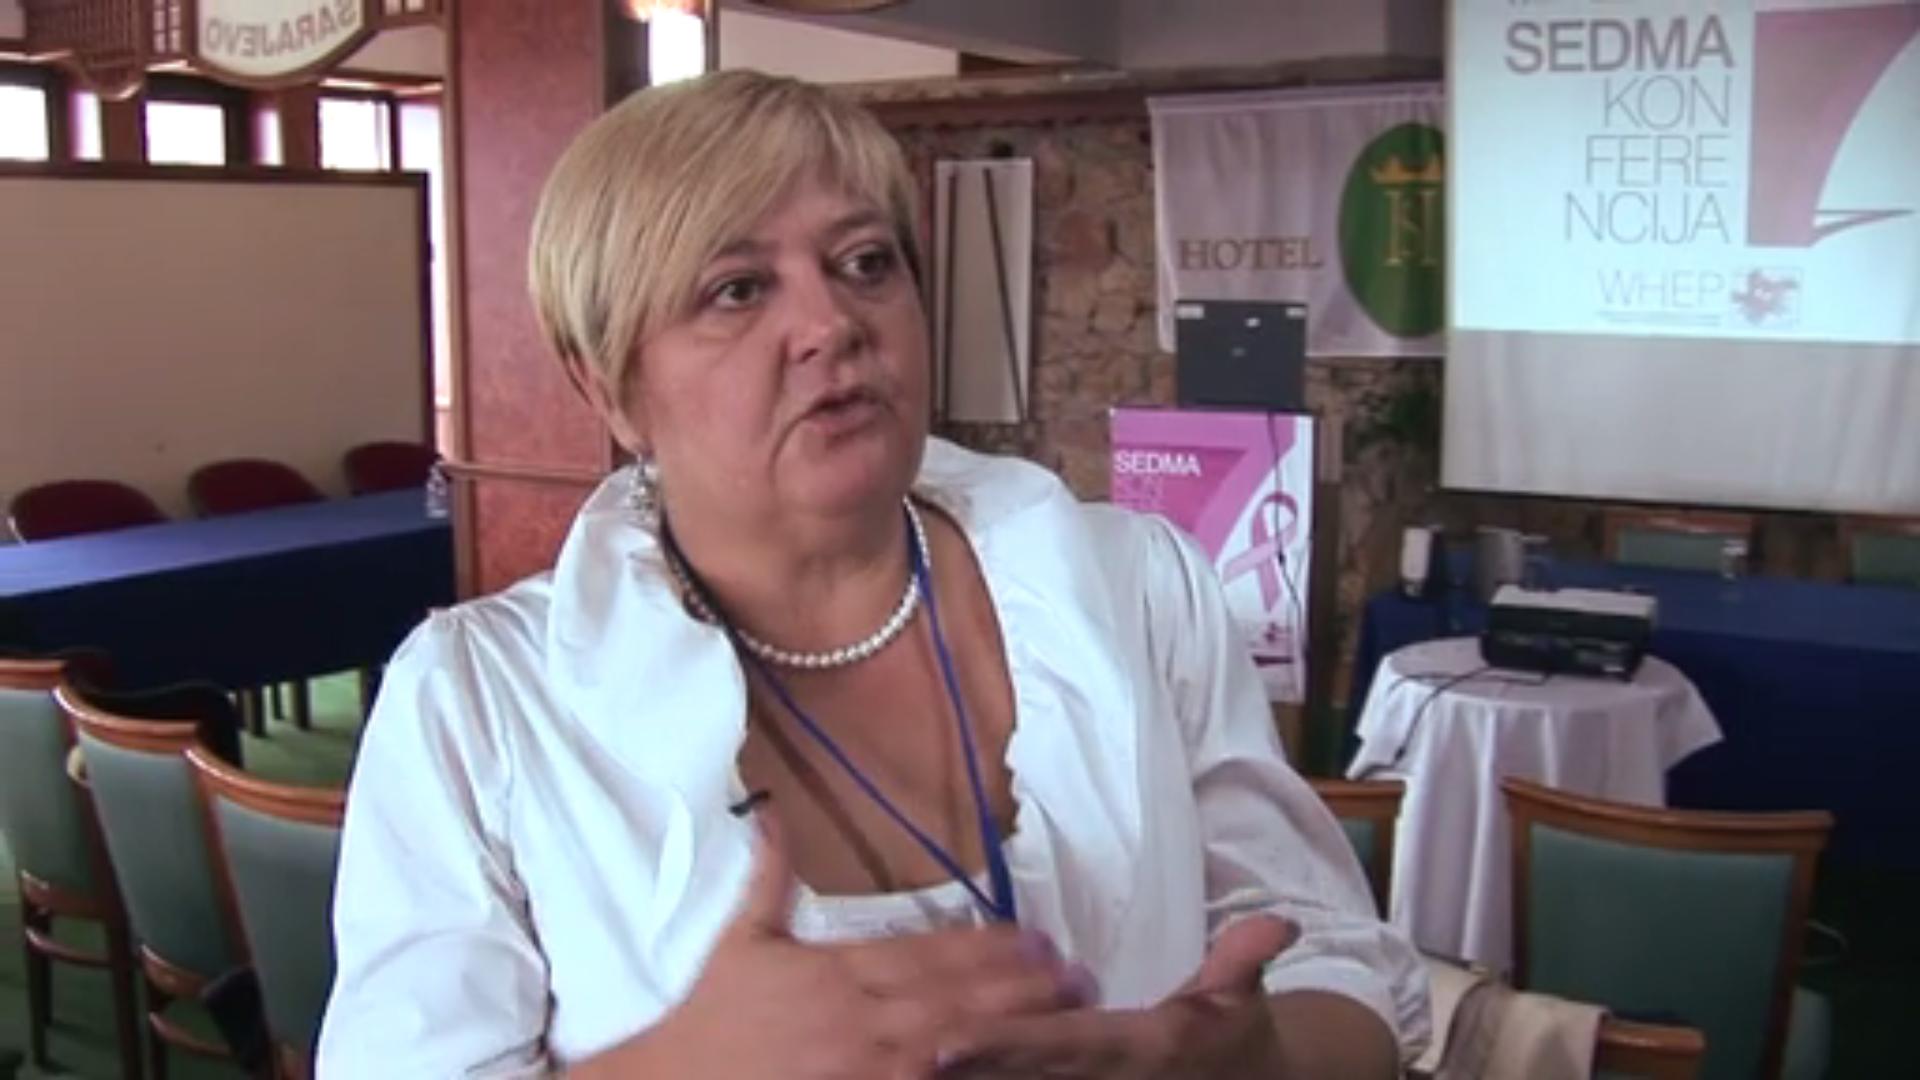 Shattering a Deadly Taboo in Bosnia